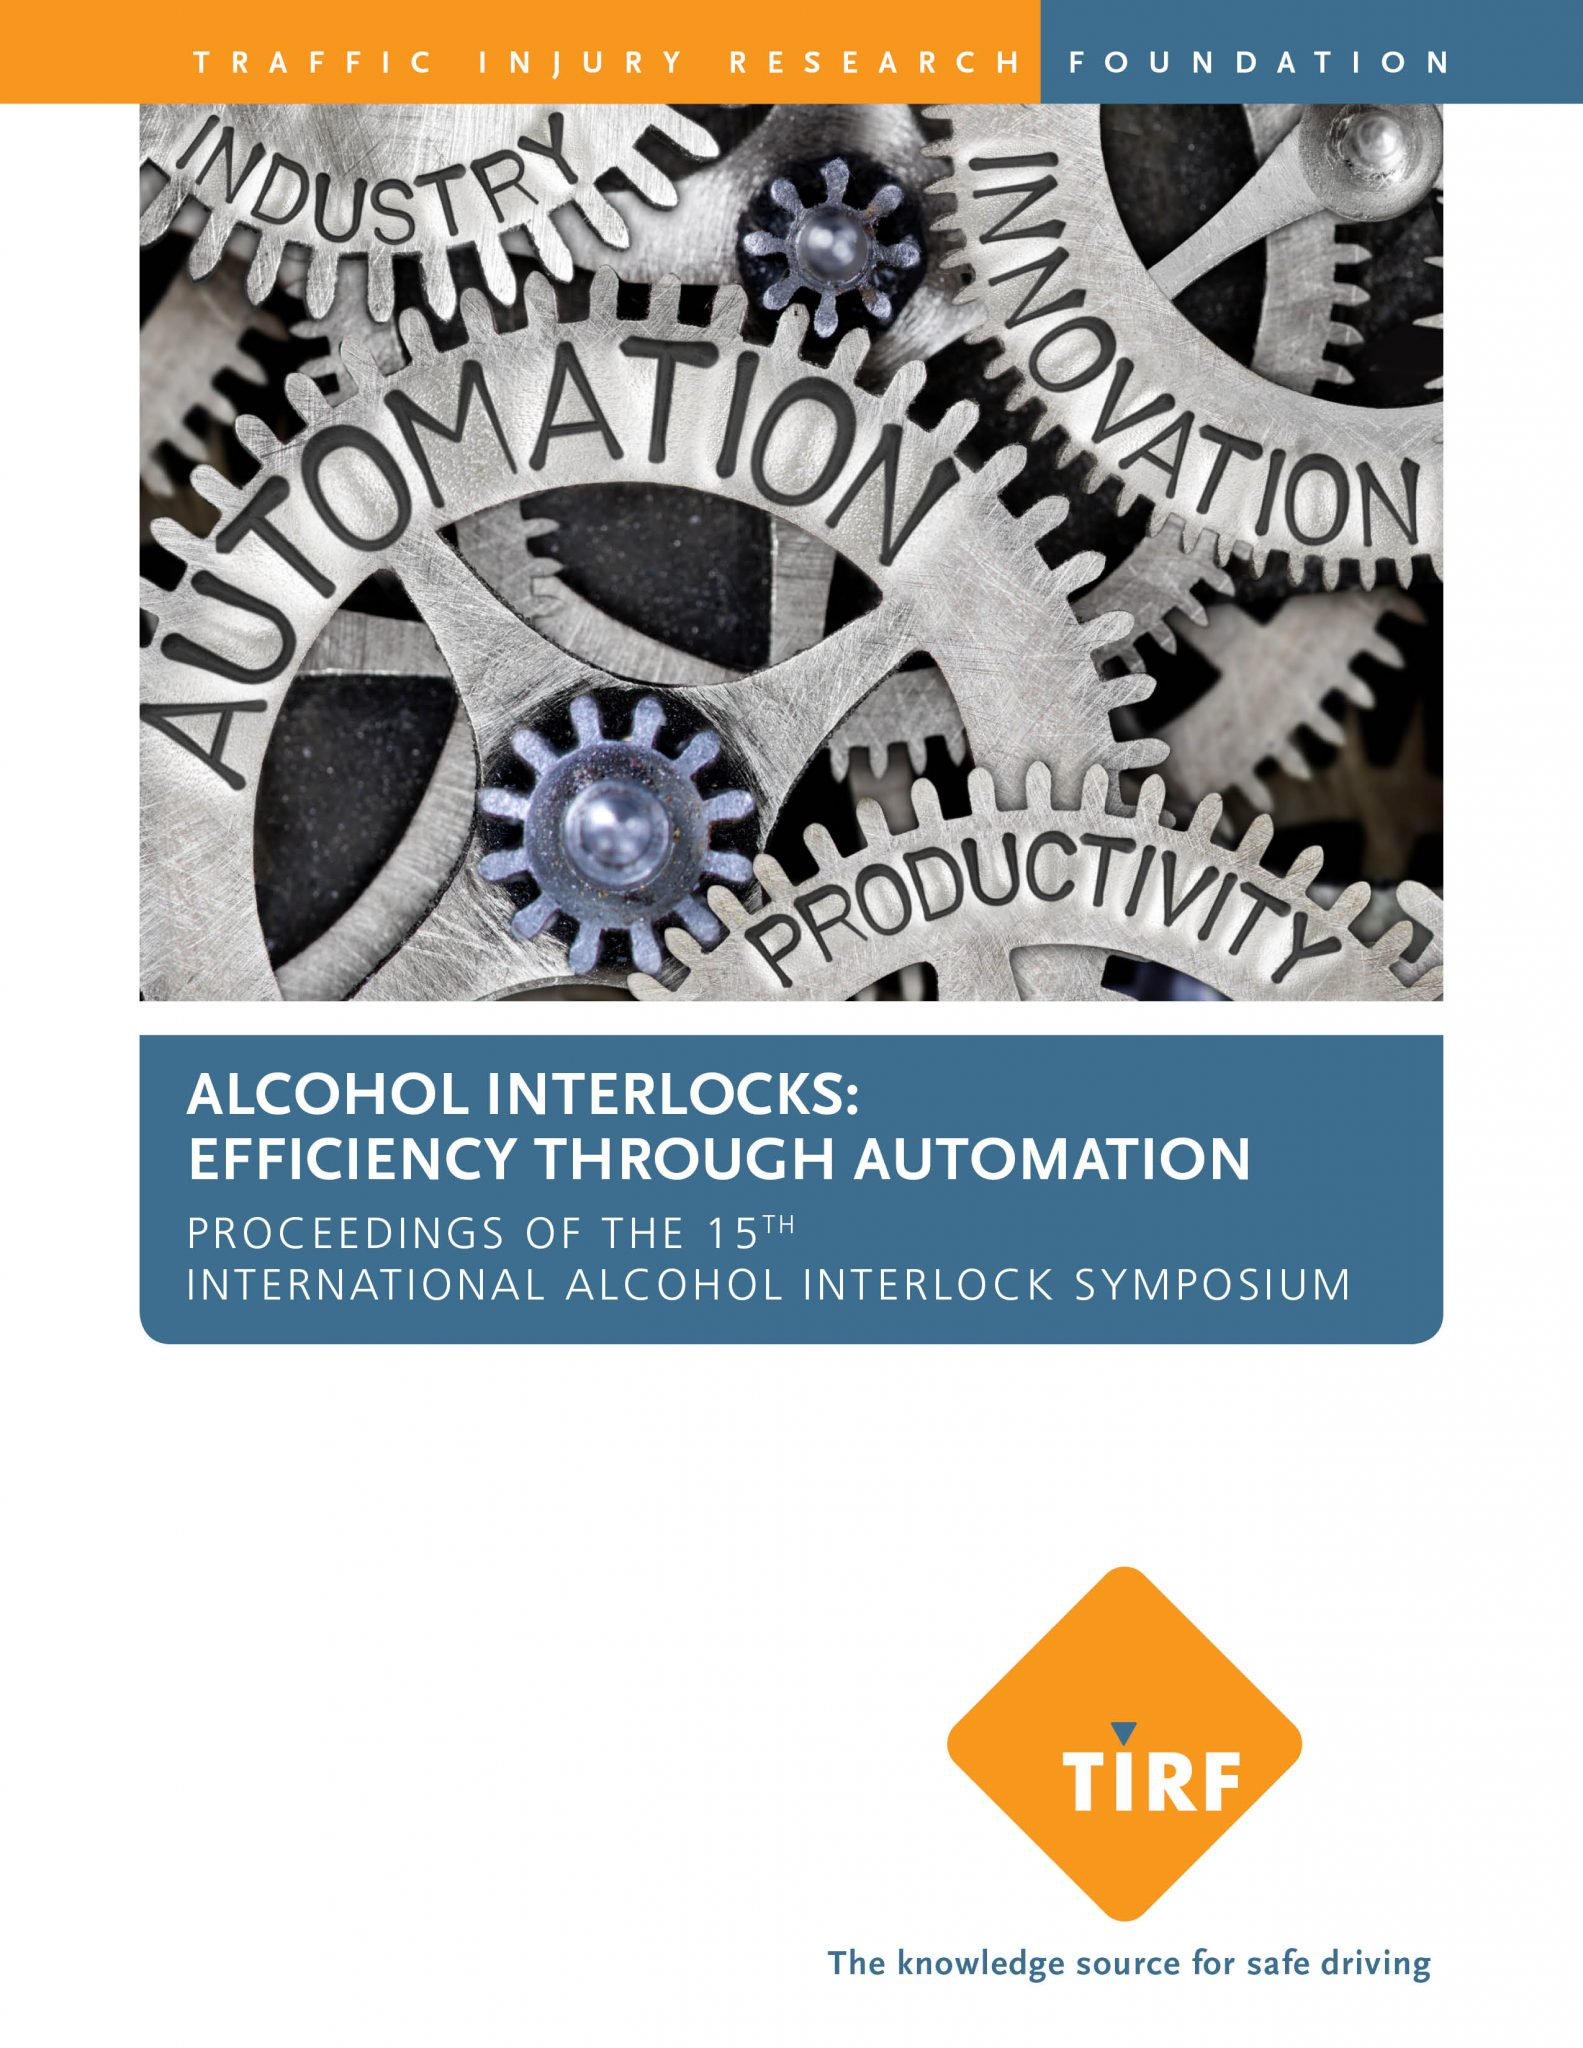 Alcohol Interlocks: Efficiency Through Automation – Proceedings of the 15th International Alcohol Interlock Symposium